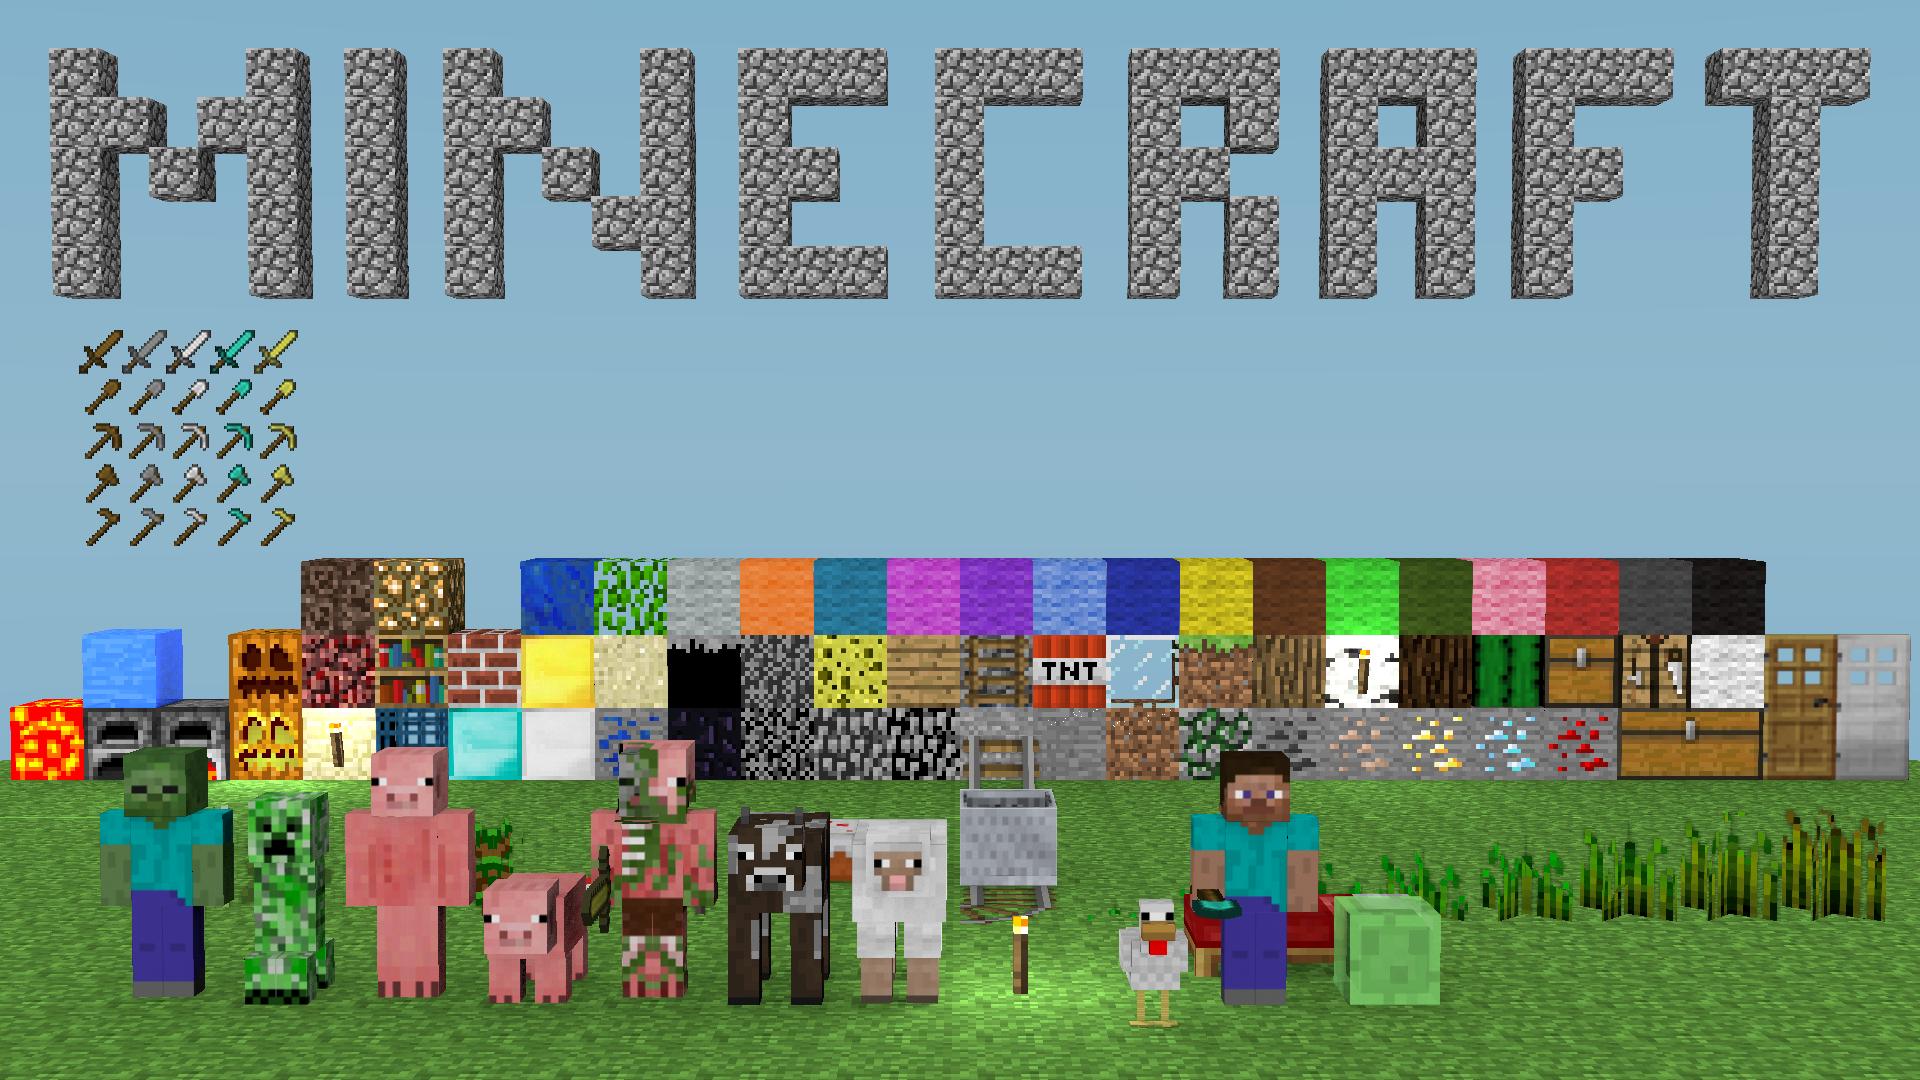 Digital-Divide-Conquer-Minecraft-Sparks-Motivation-wallpaper-wp3404661